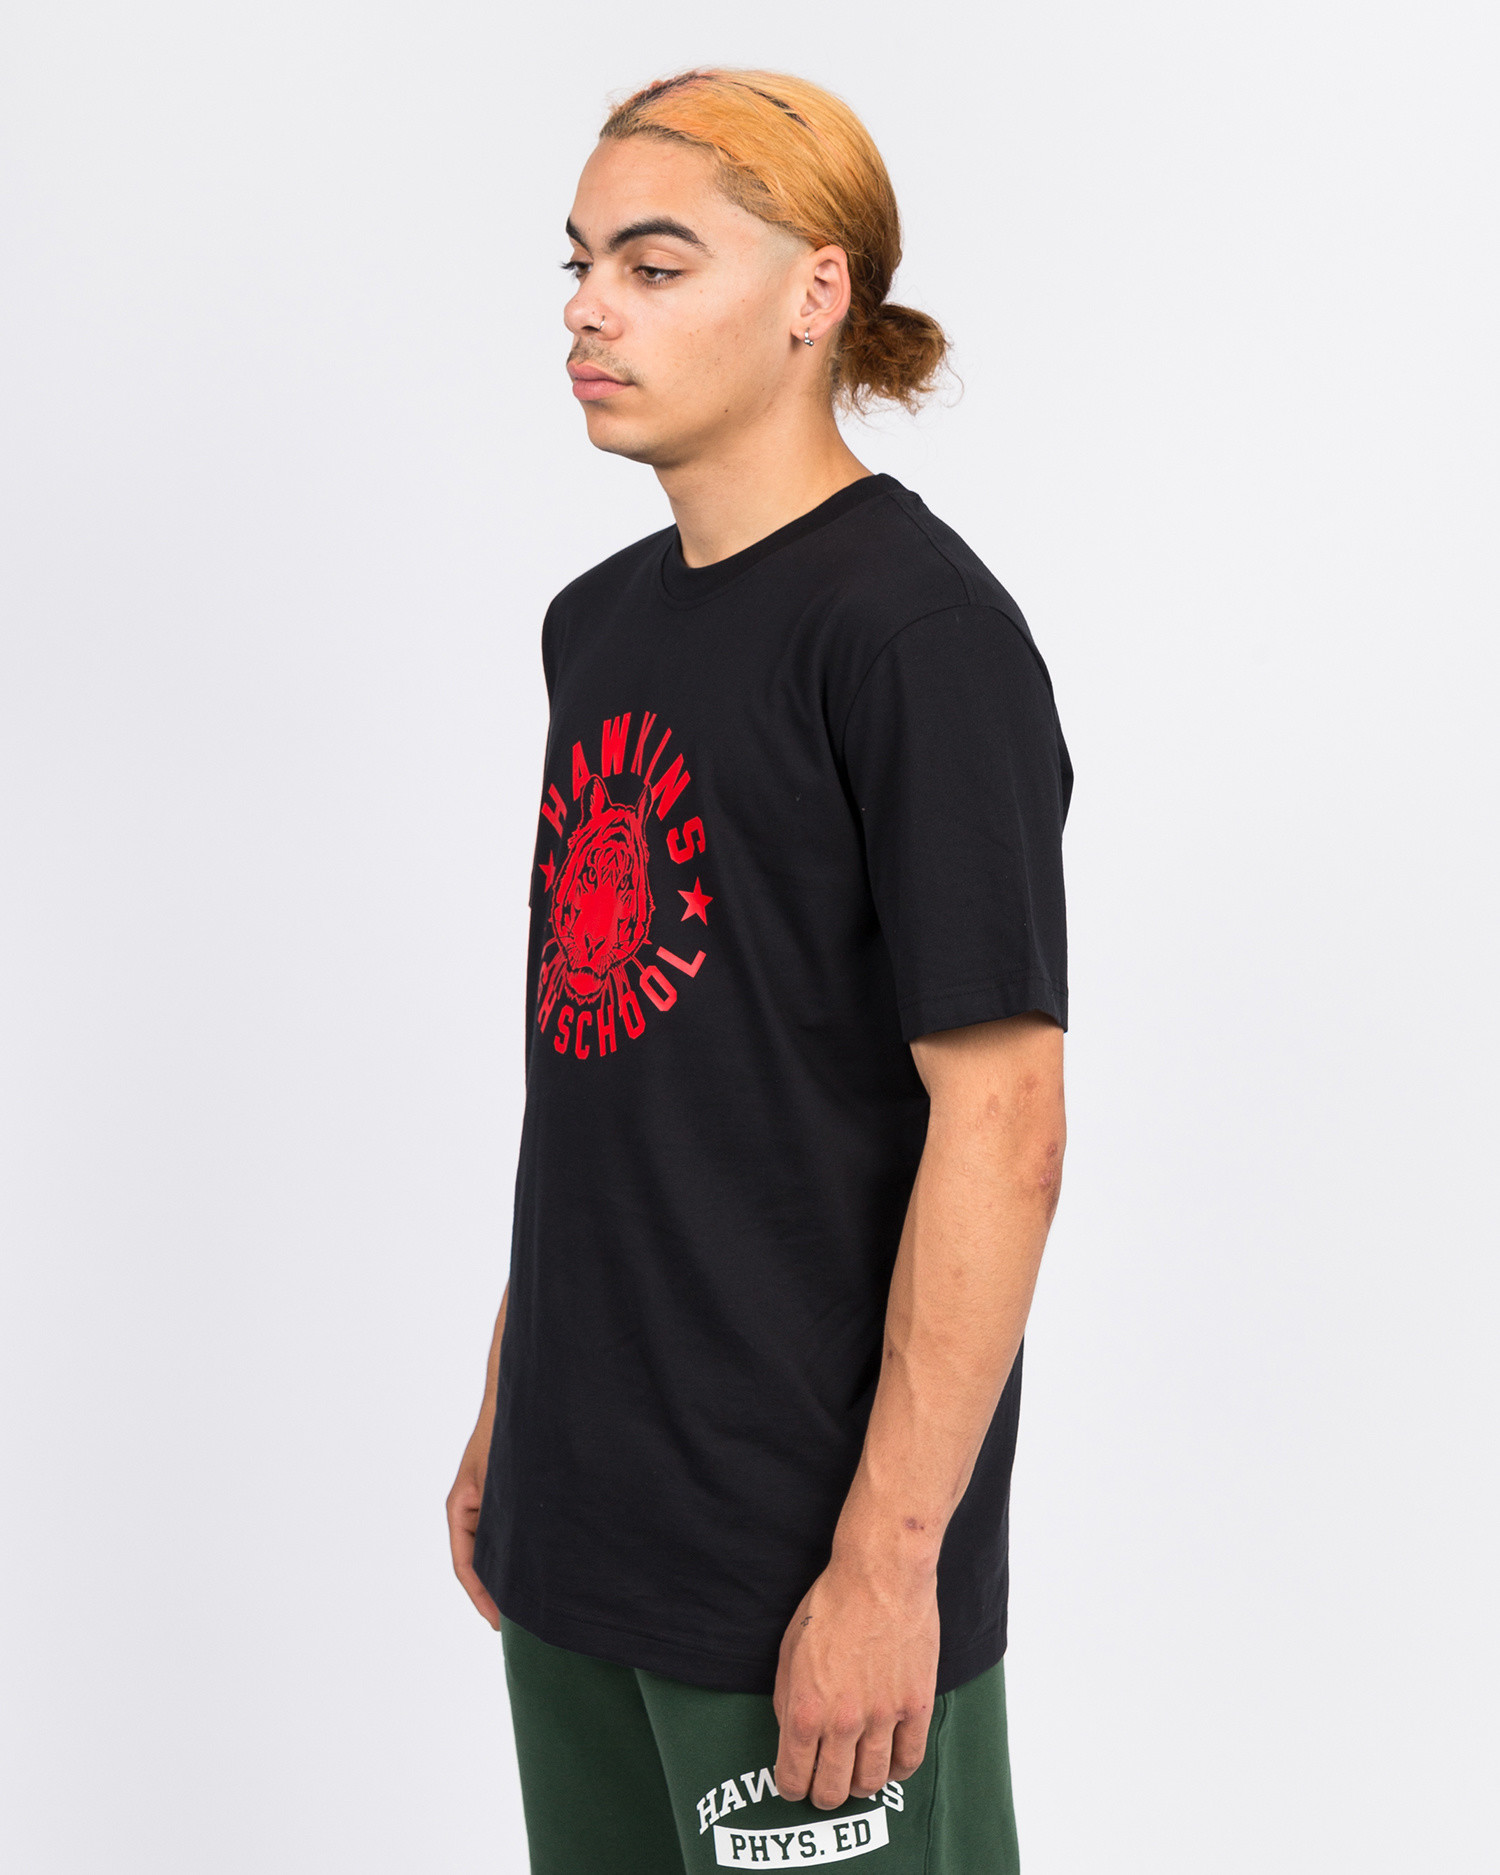 Nike Stranger Things Shortsleeve T-shirt Black/University Red